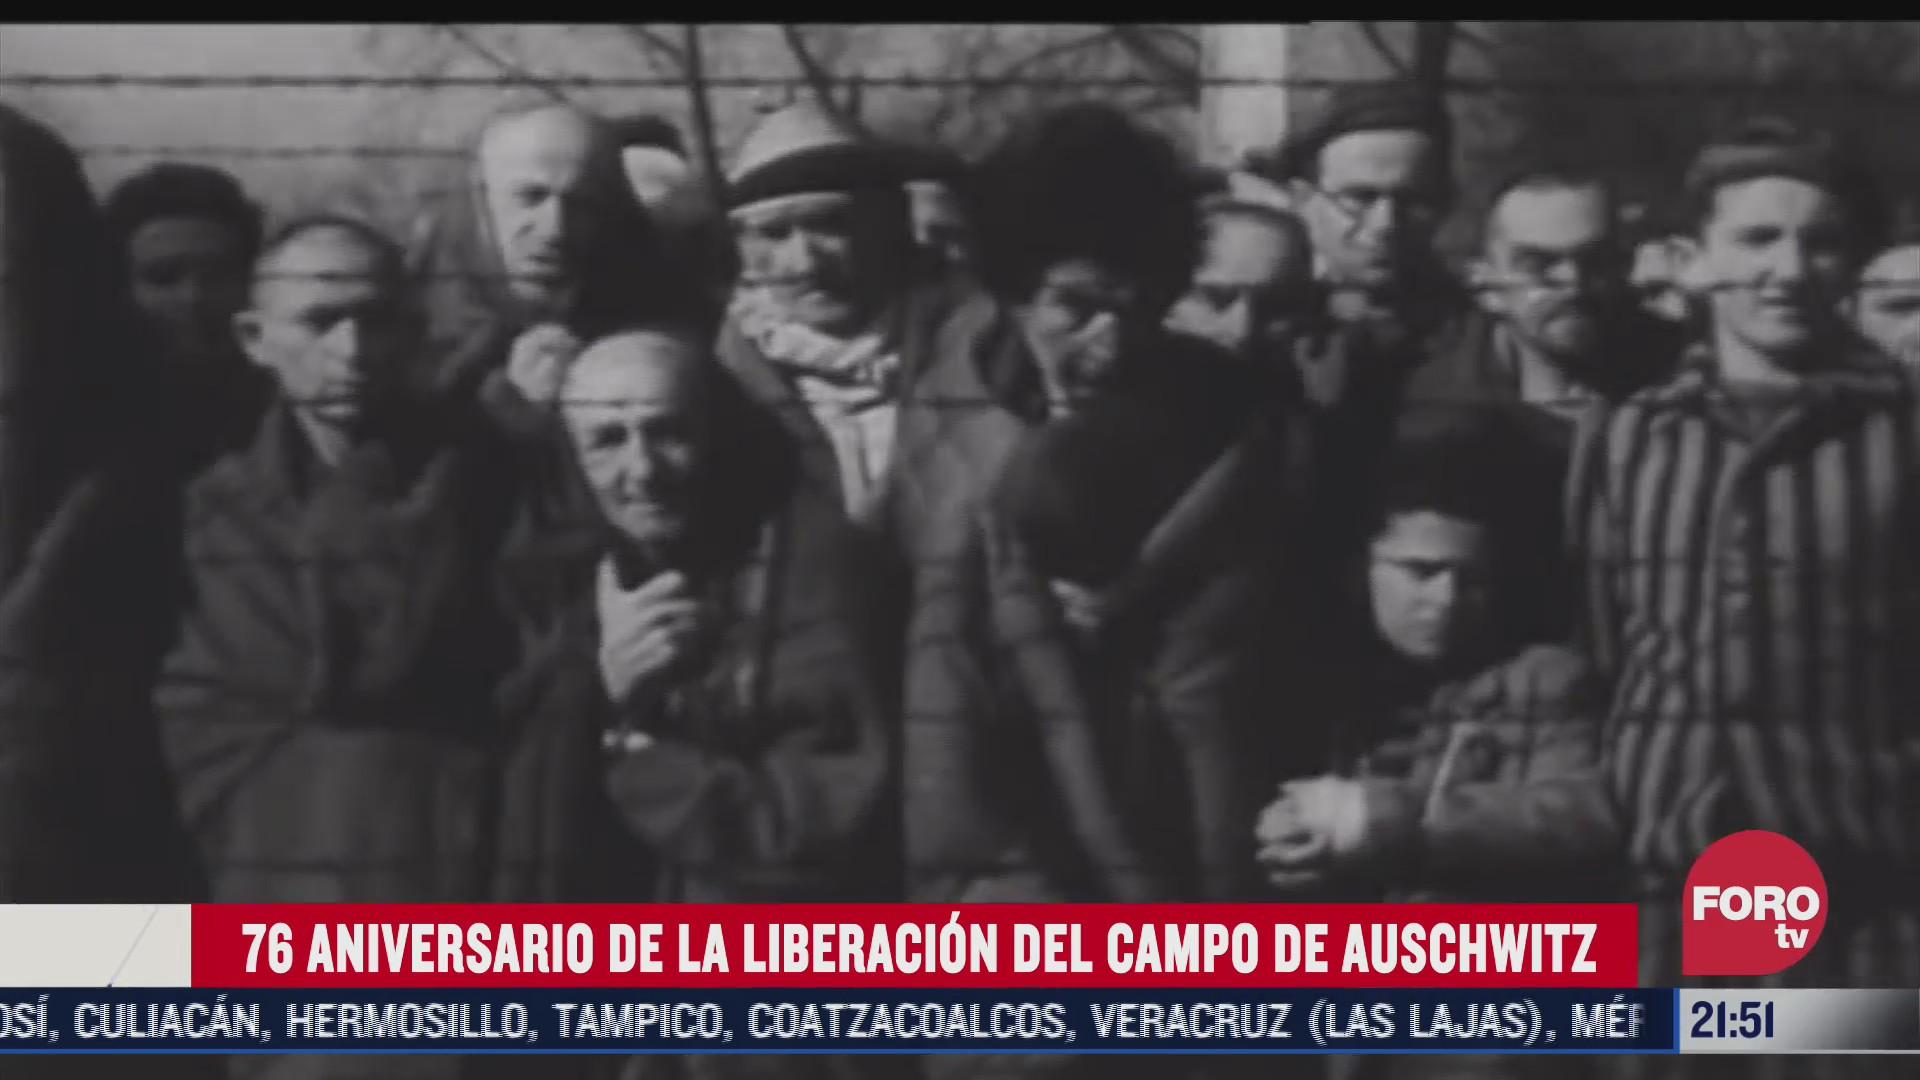 liberacion del campo de auschwitz cumple 76 anos